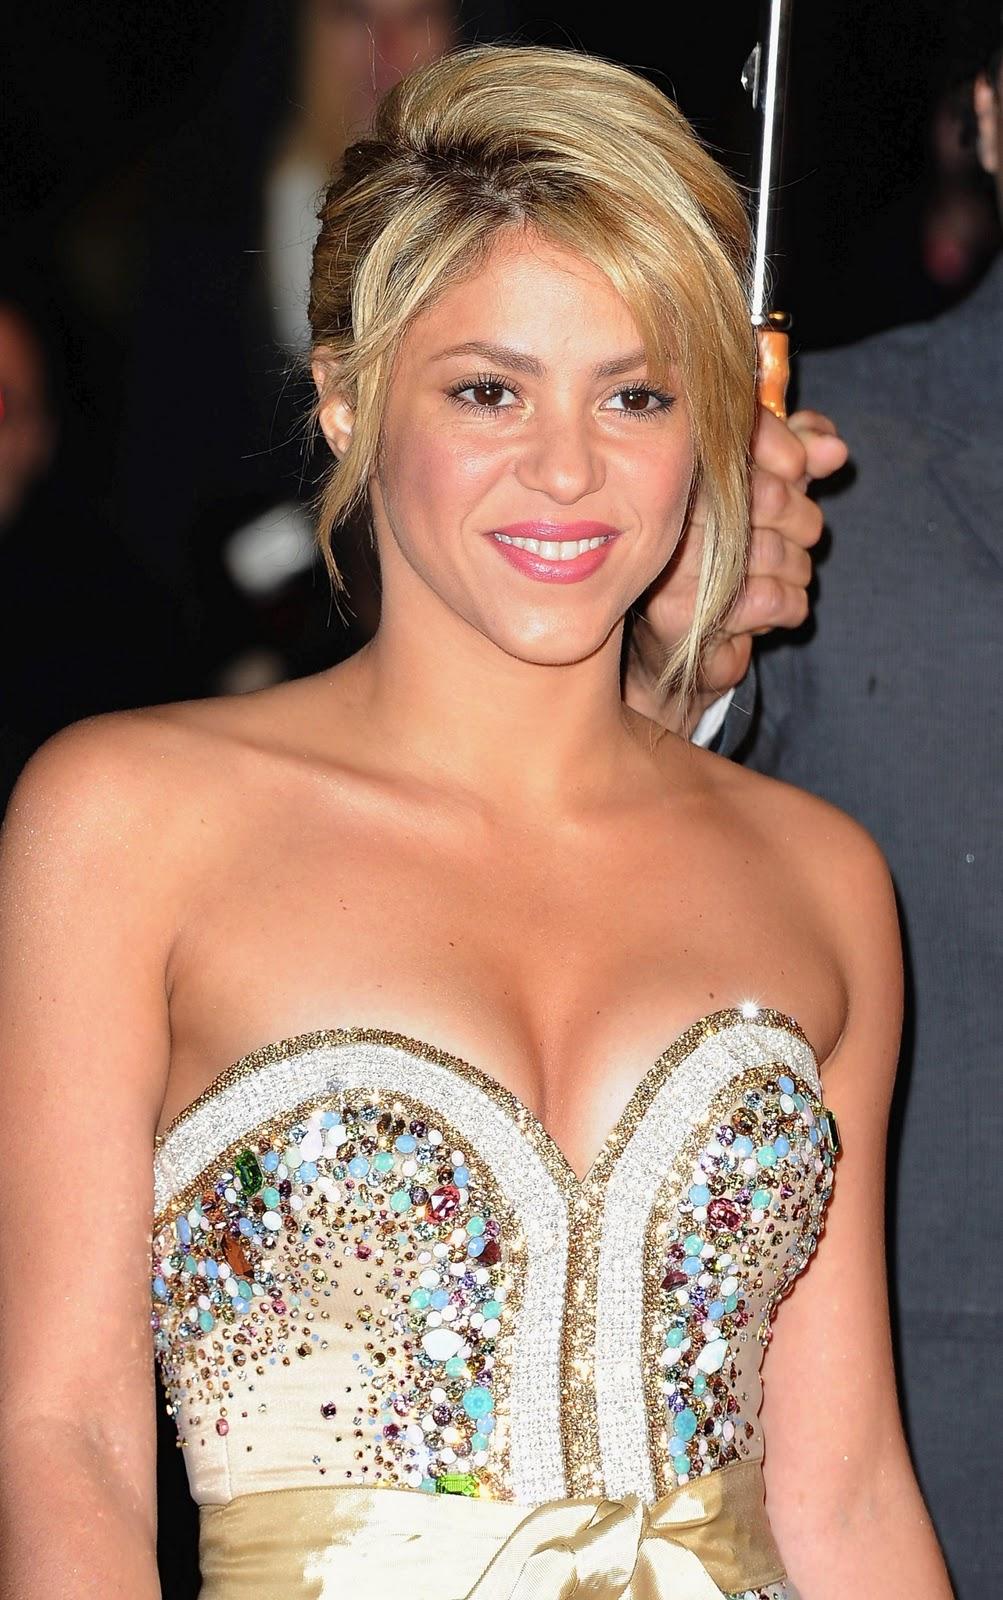 Indian Girl Wallpaper Full Hd Download Shakira Hot Hollywood Spicy Actress Photos 2012 Hot Full